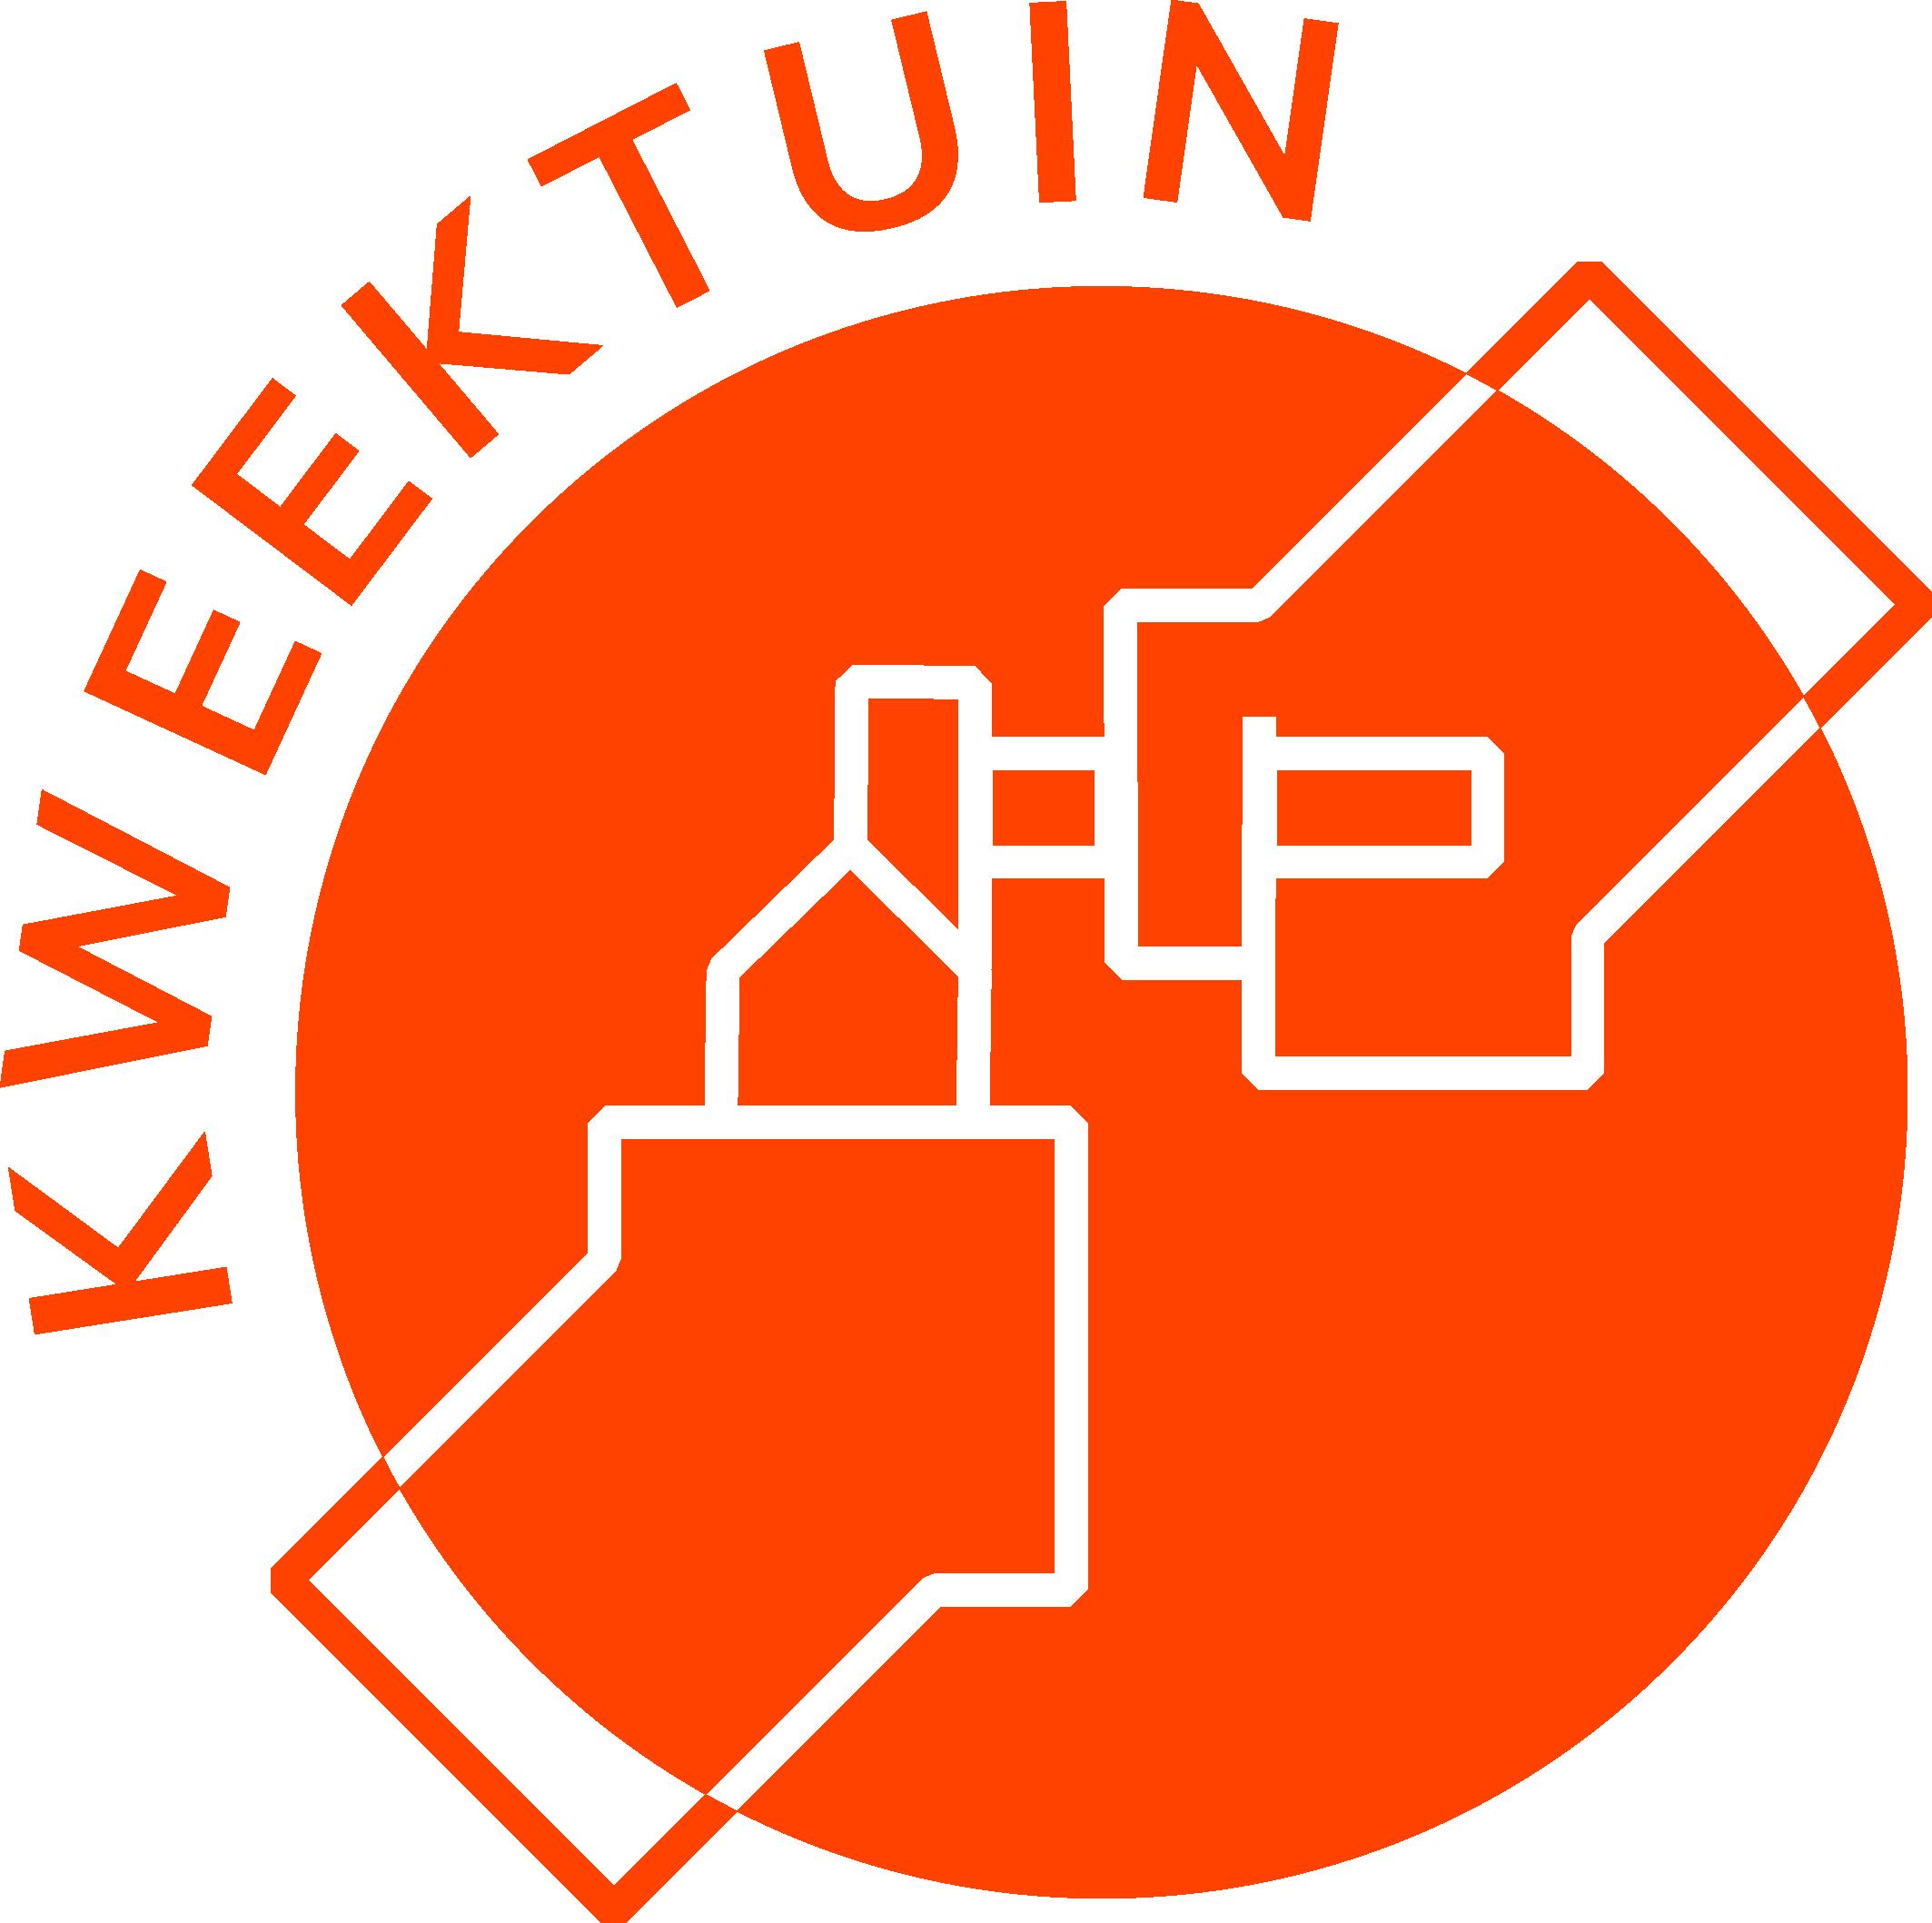 KWEEKTUIN logo